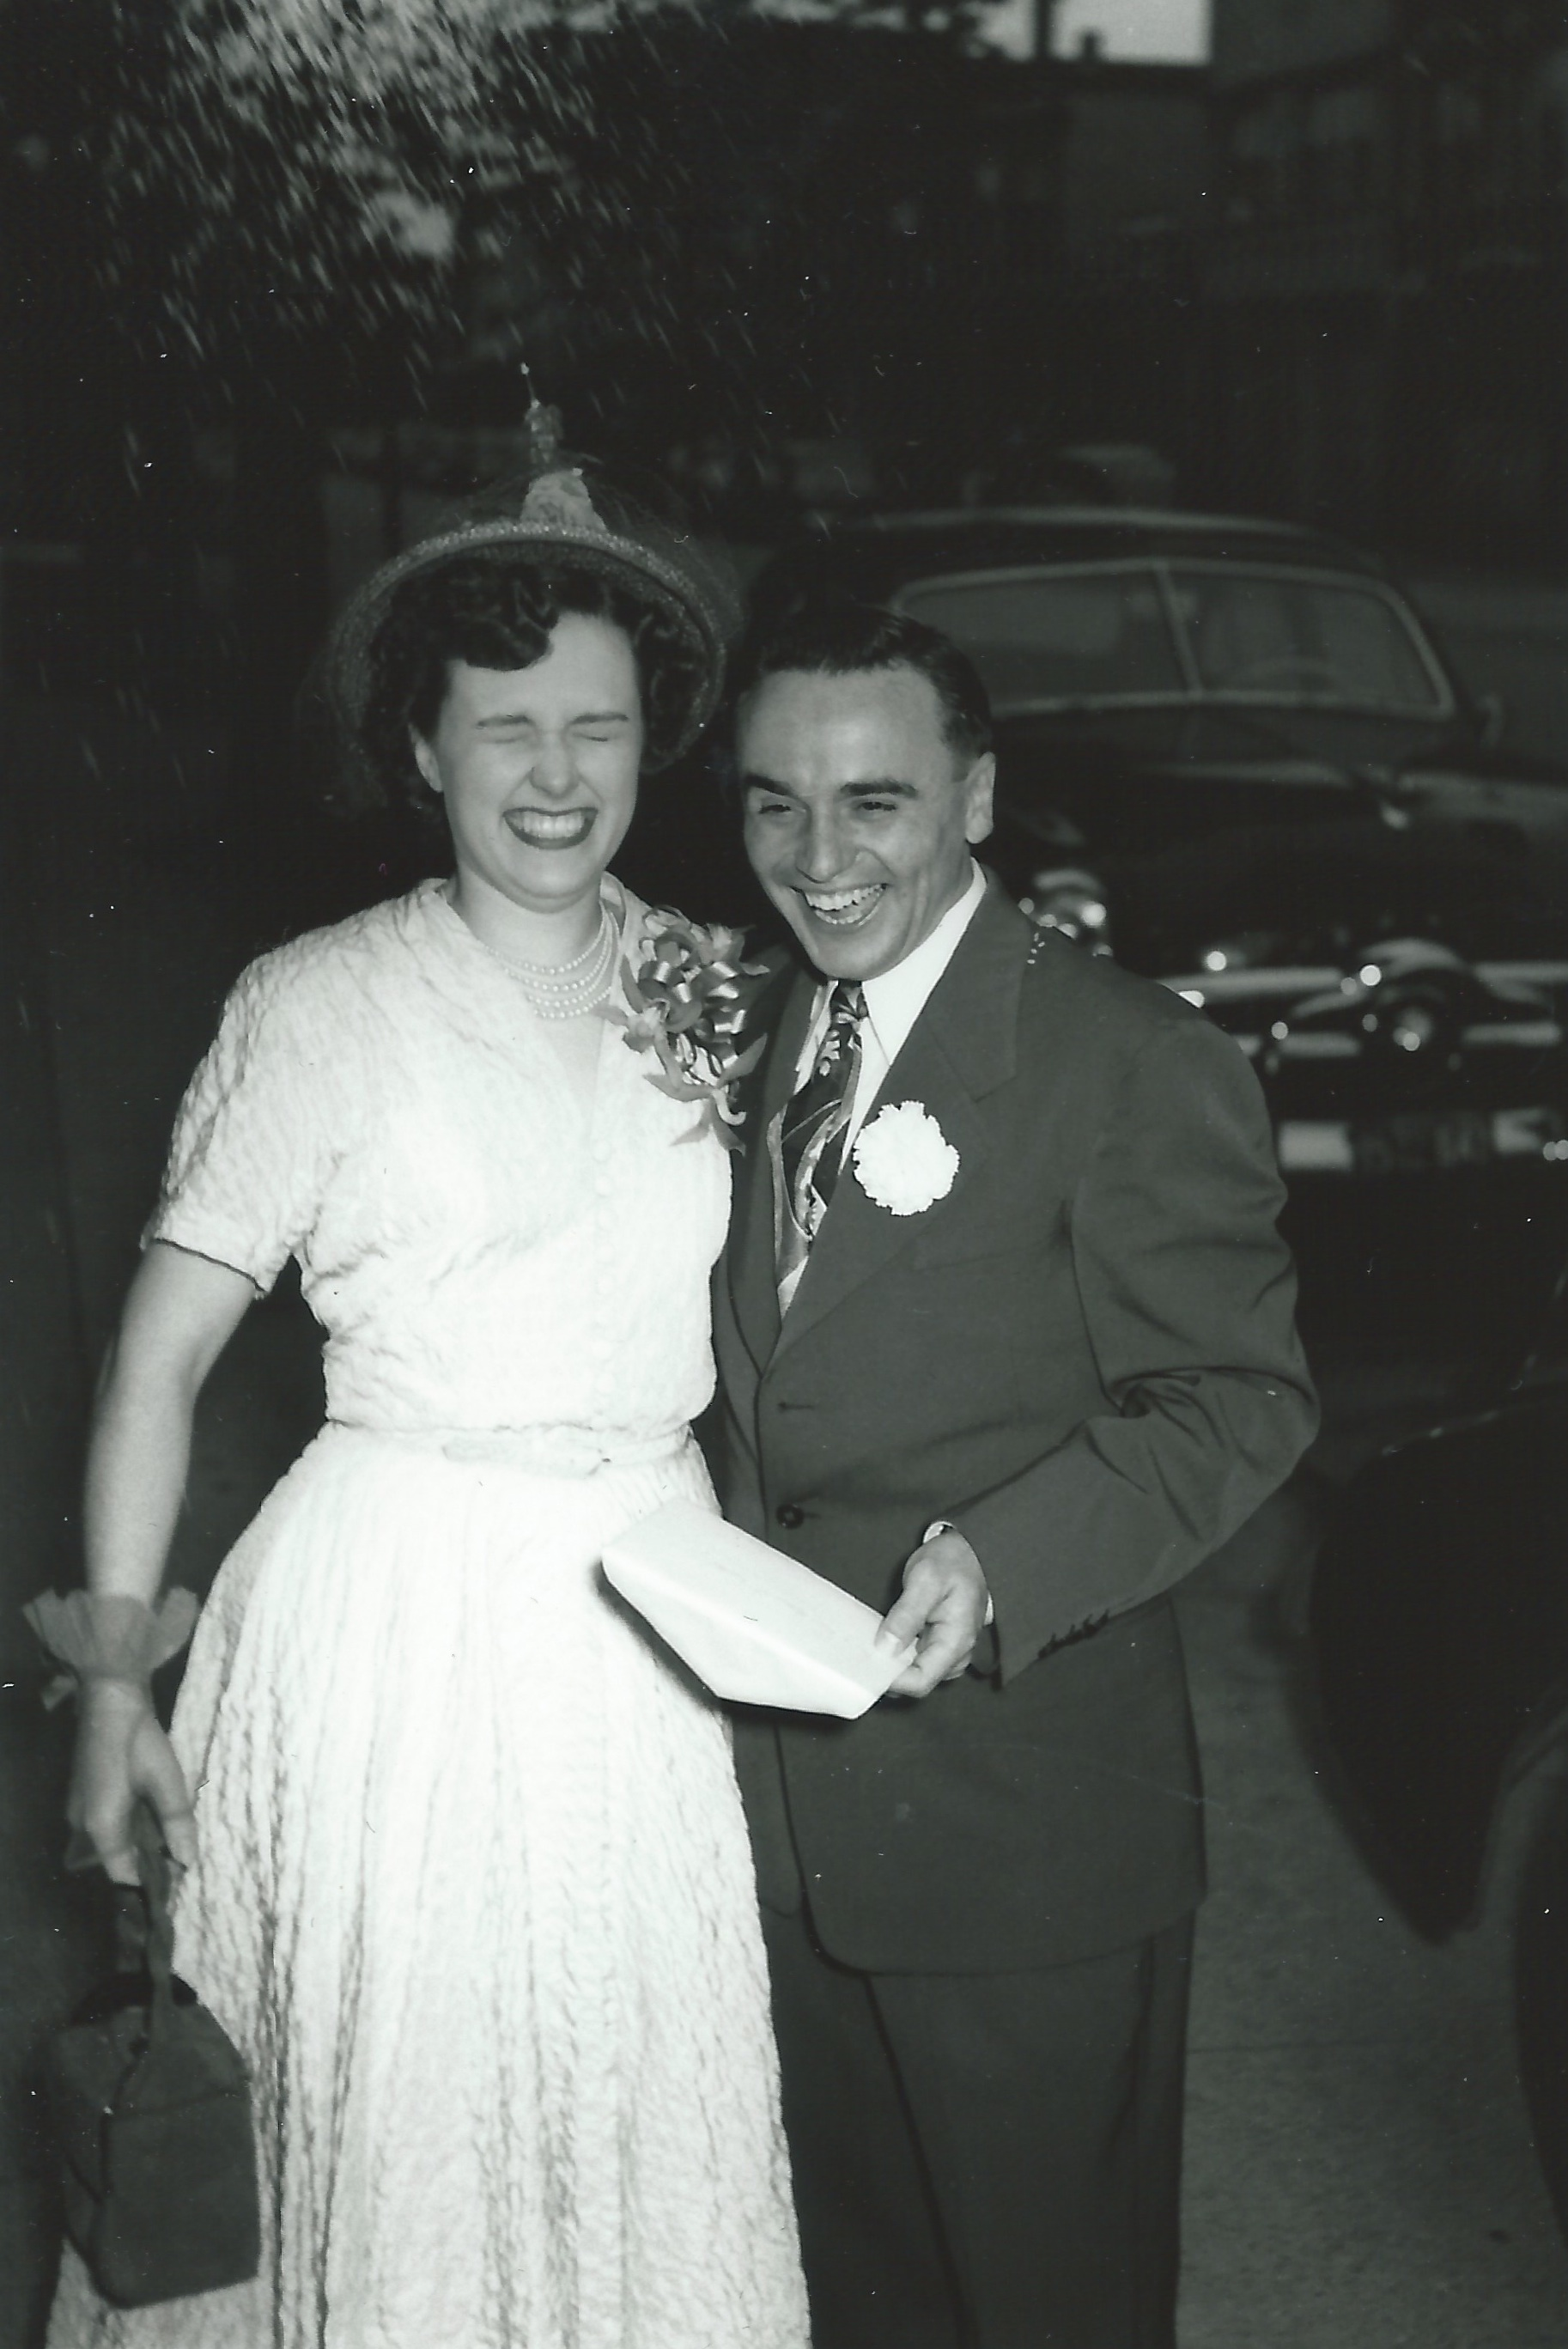 Phyllis and Bob on their wedding day.